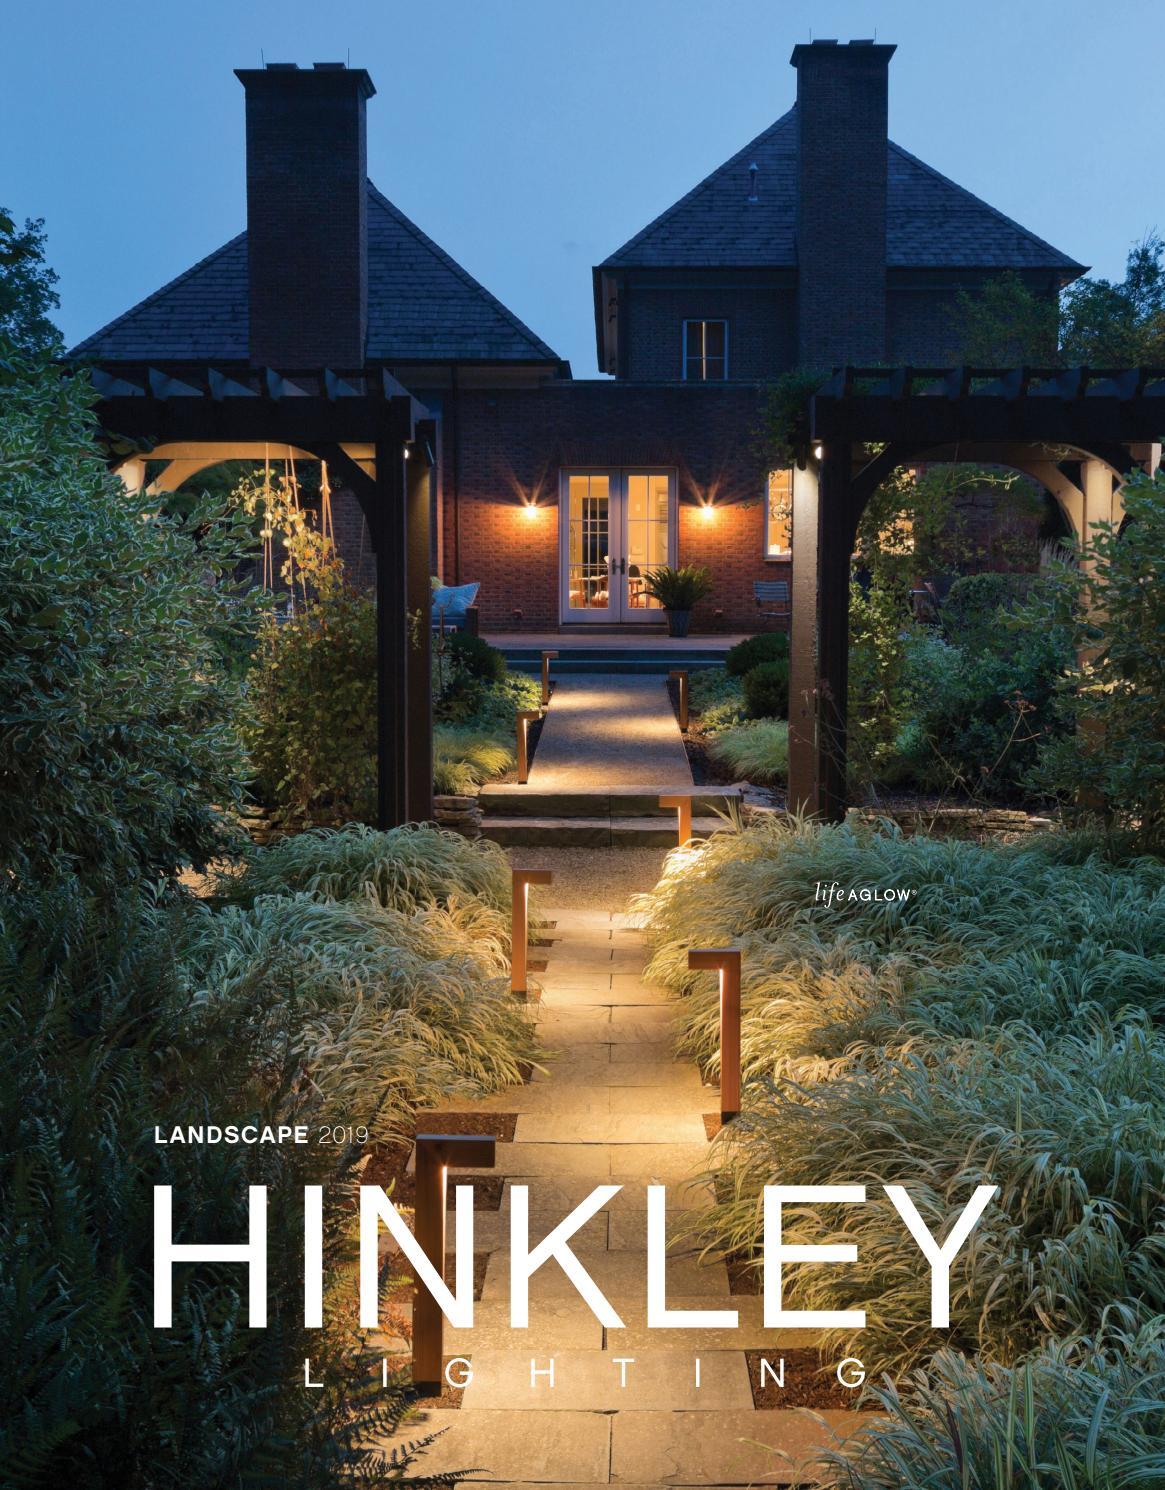 hinkley landscape catalog 2019 by